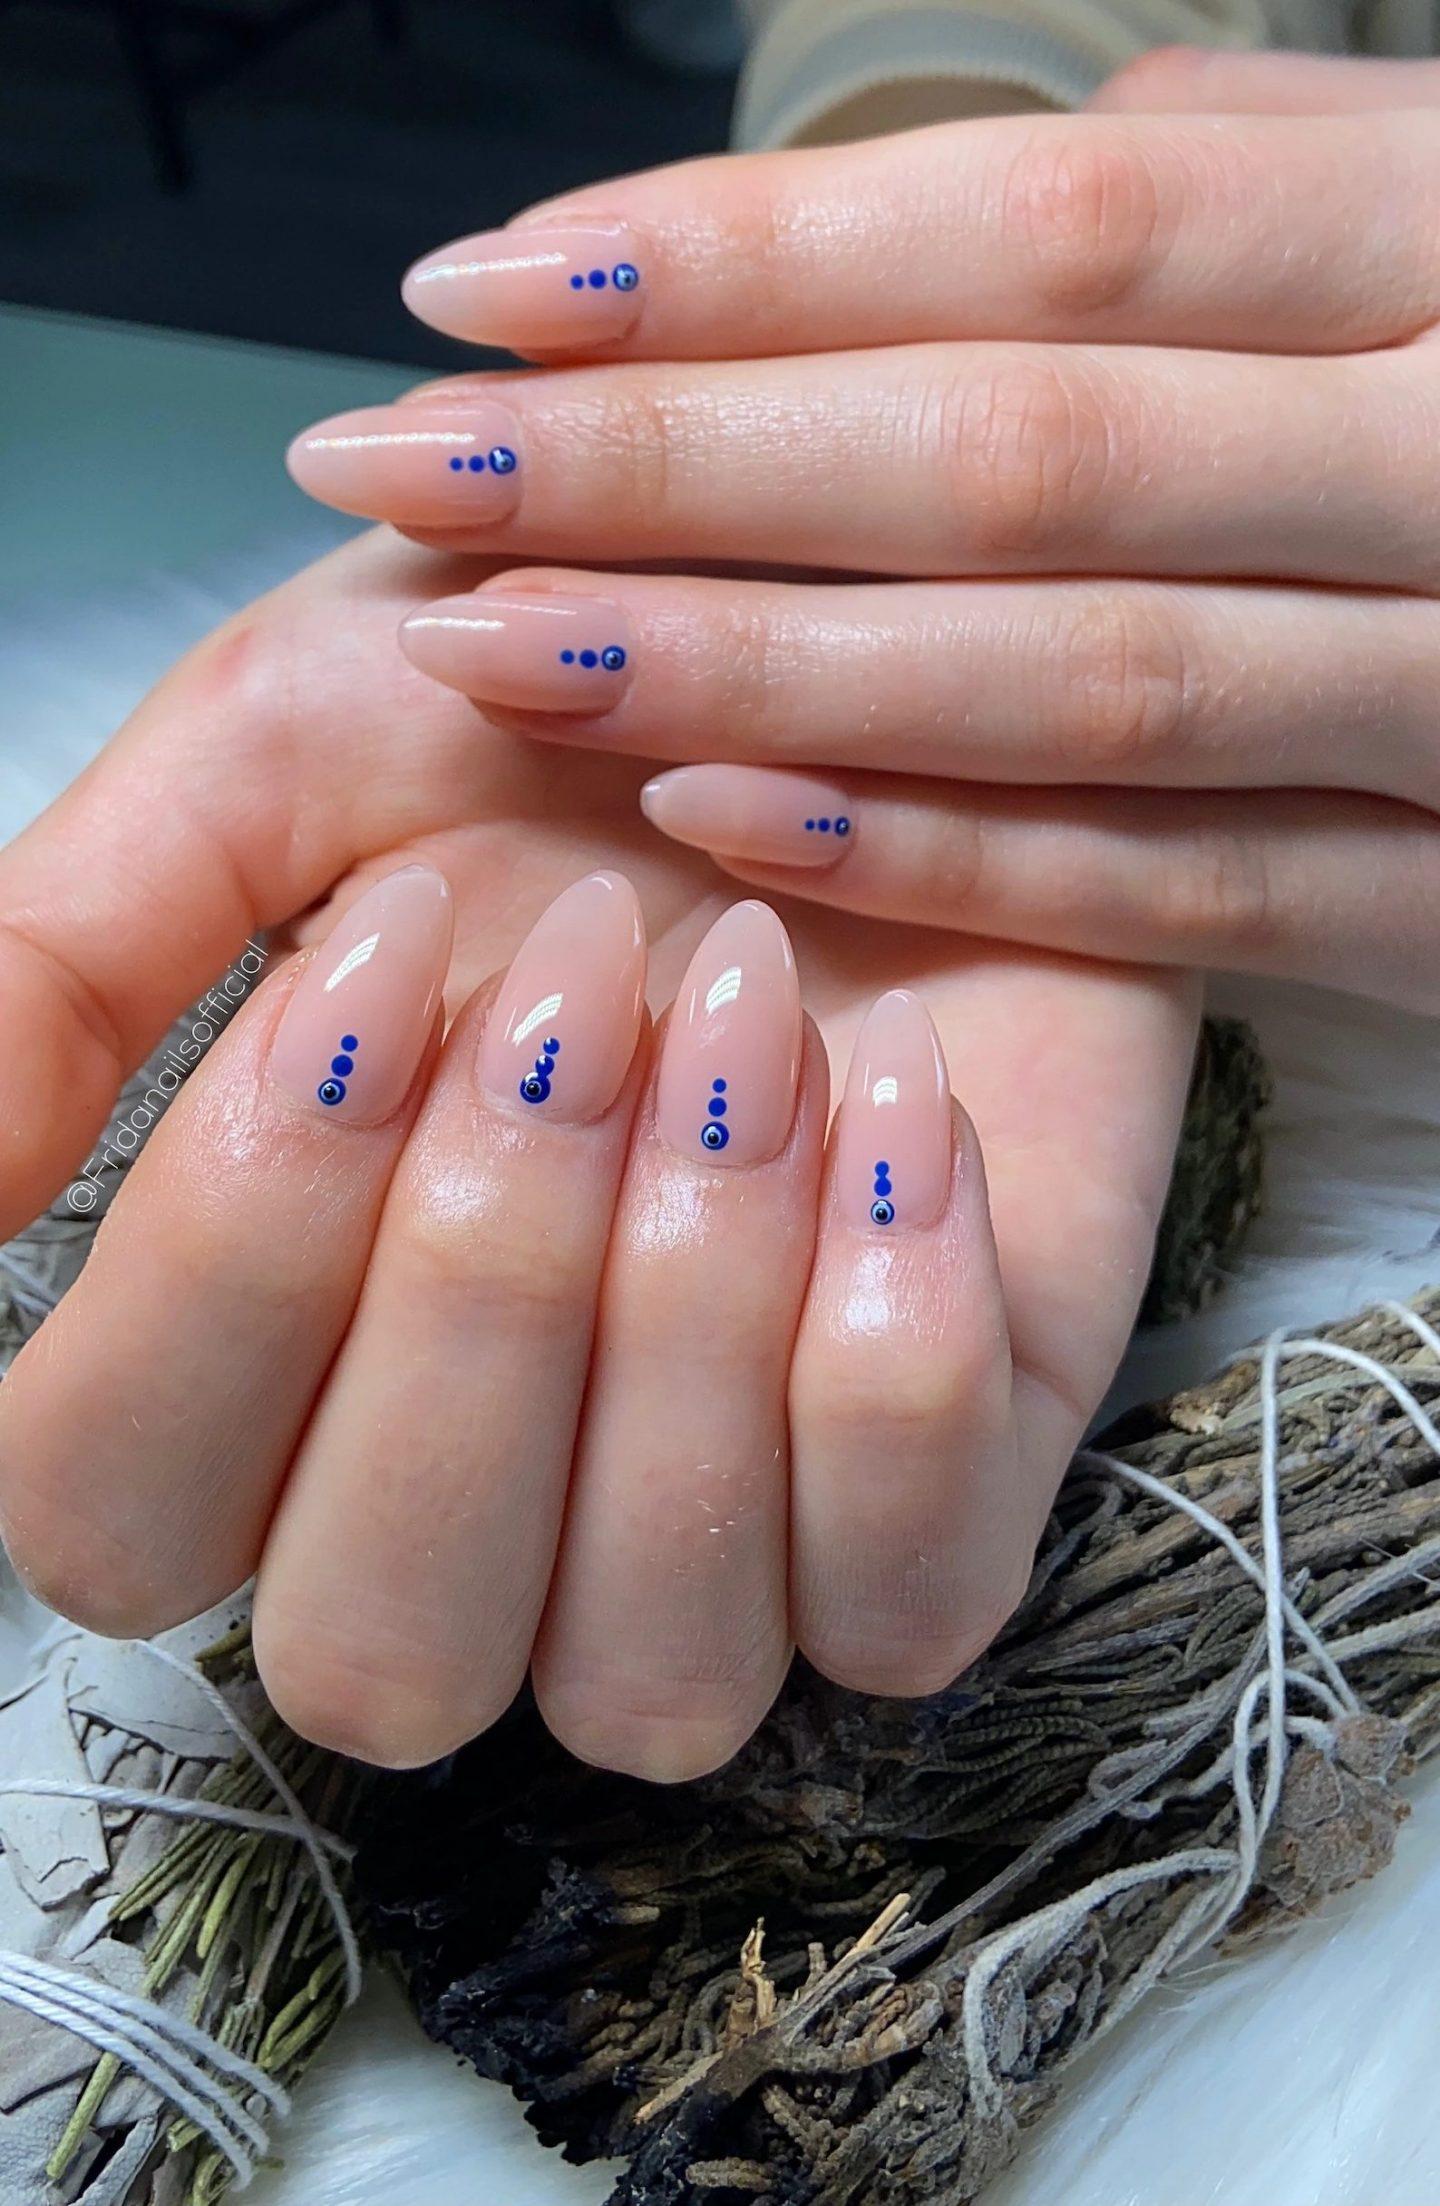 Cute minimalist evil eye nails